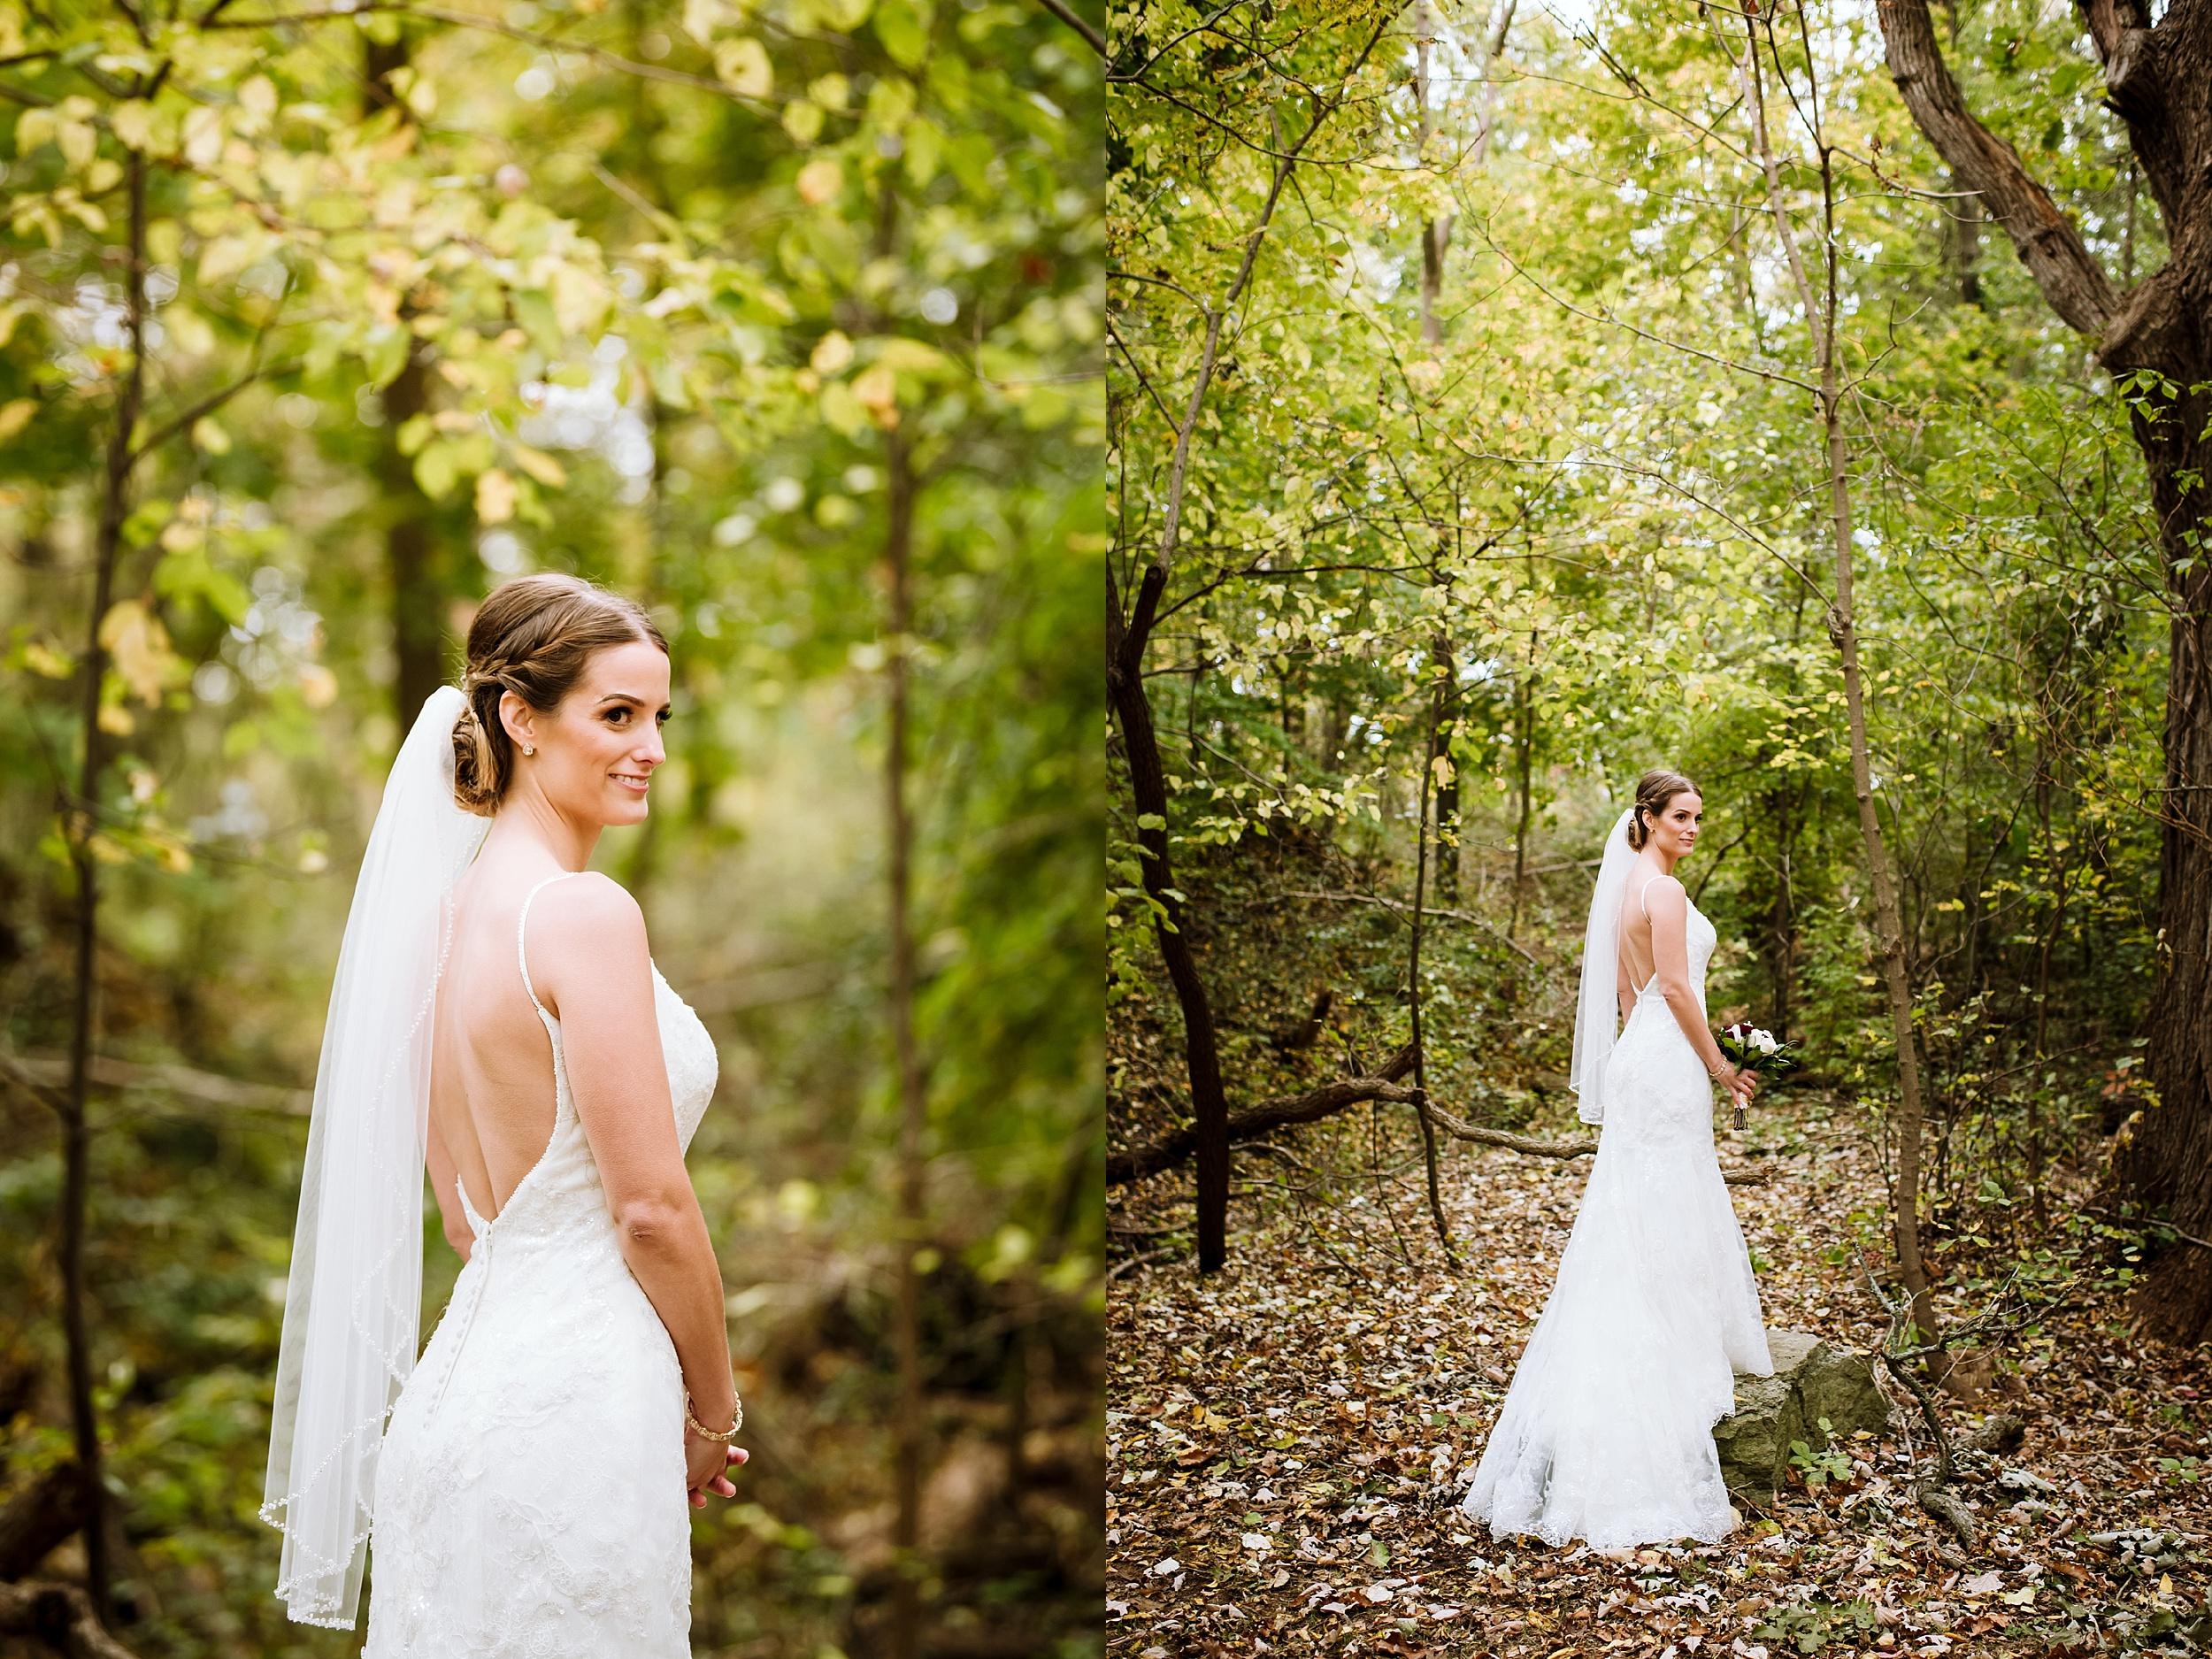 Windemere_Manor_Fall_Wedding_London_Toronto_Wedding_Photographer_0017.jpg